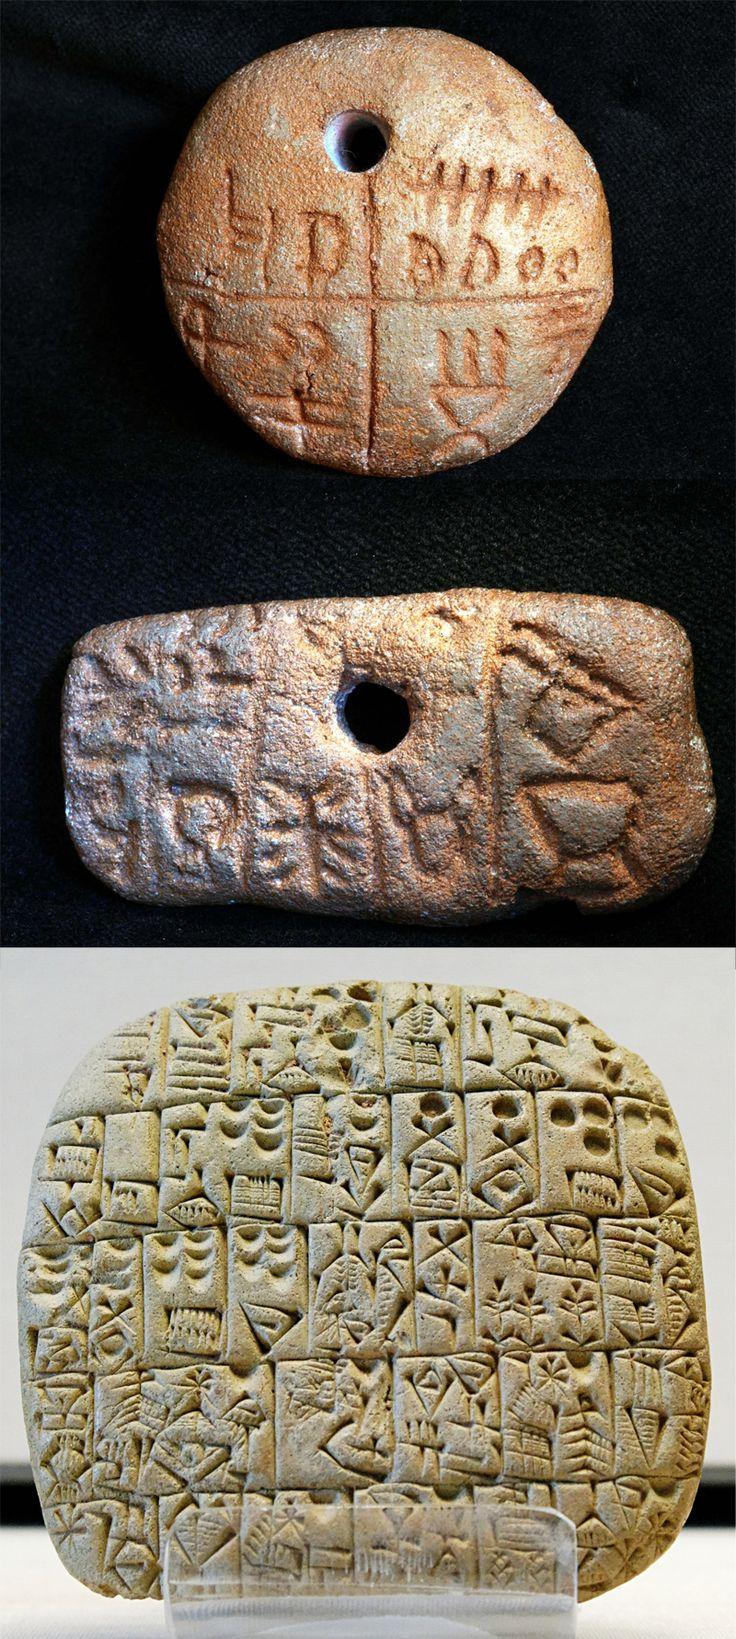 Vinca writing vs cuneiform http://www.pinterest.com/xadams2/vinca-cultuur-5500-v-chr-4500-v-chr/